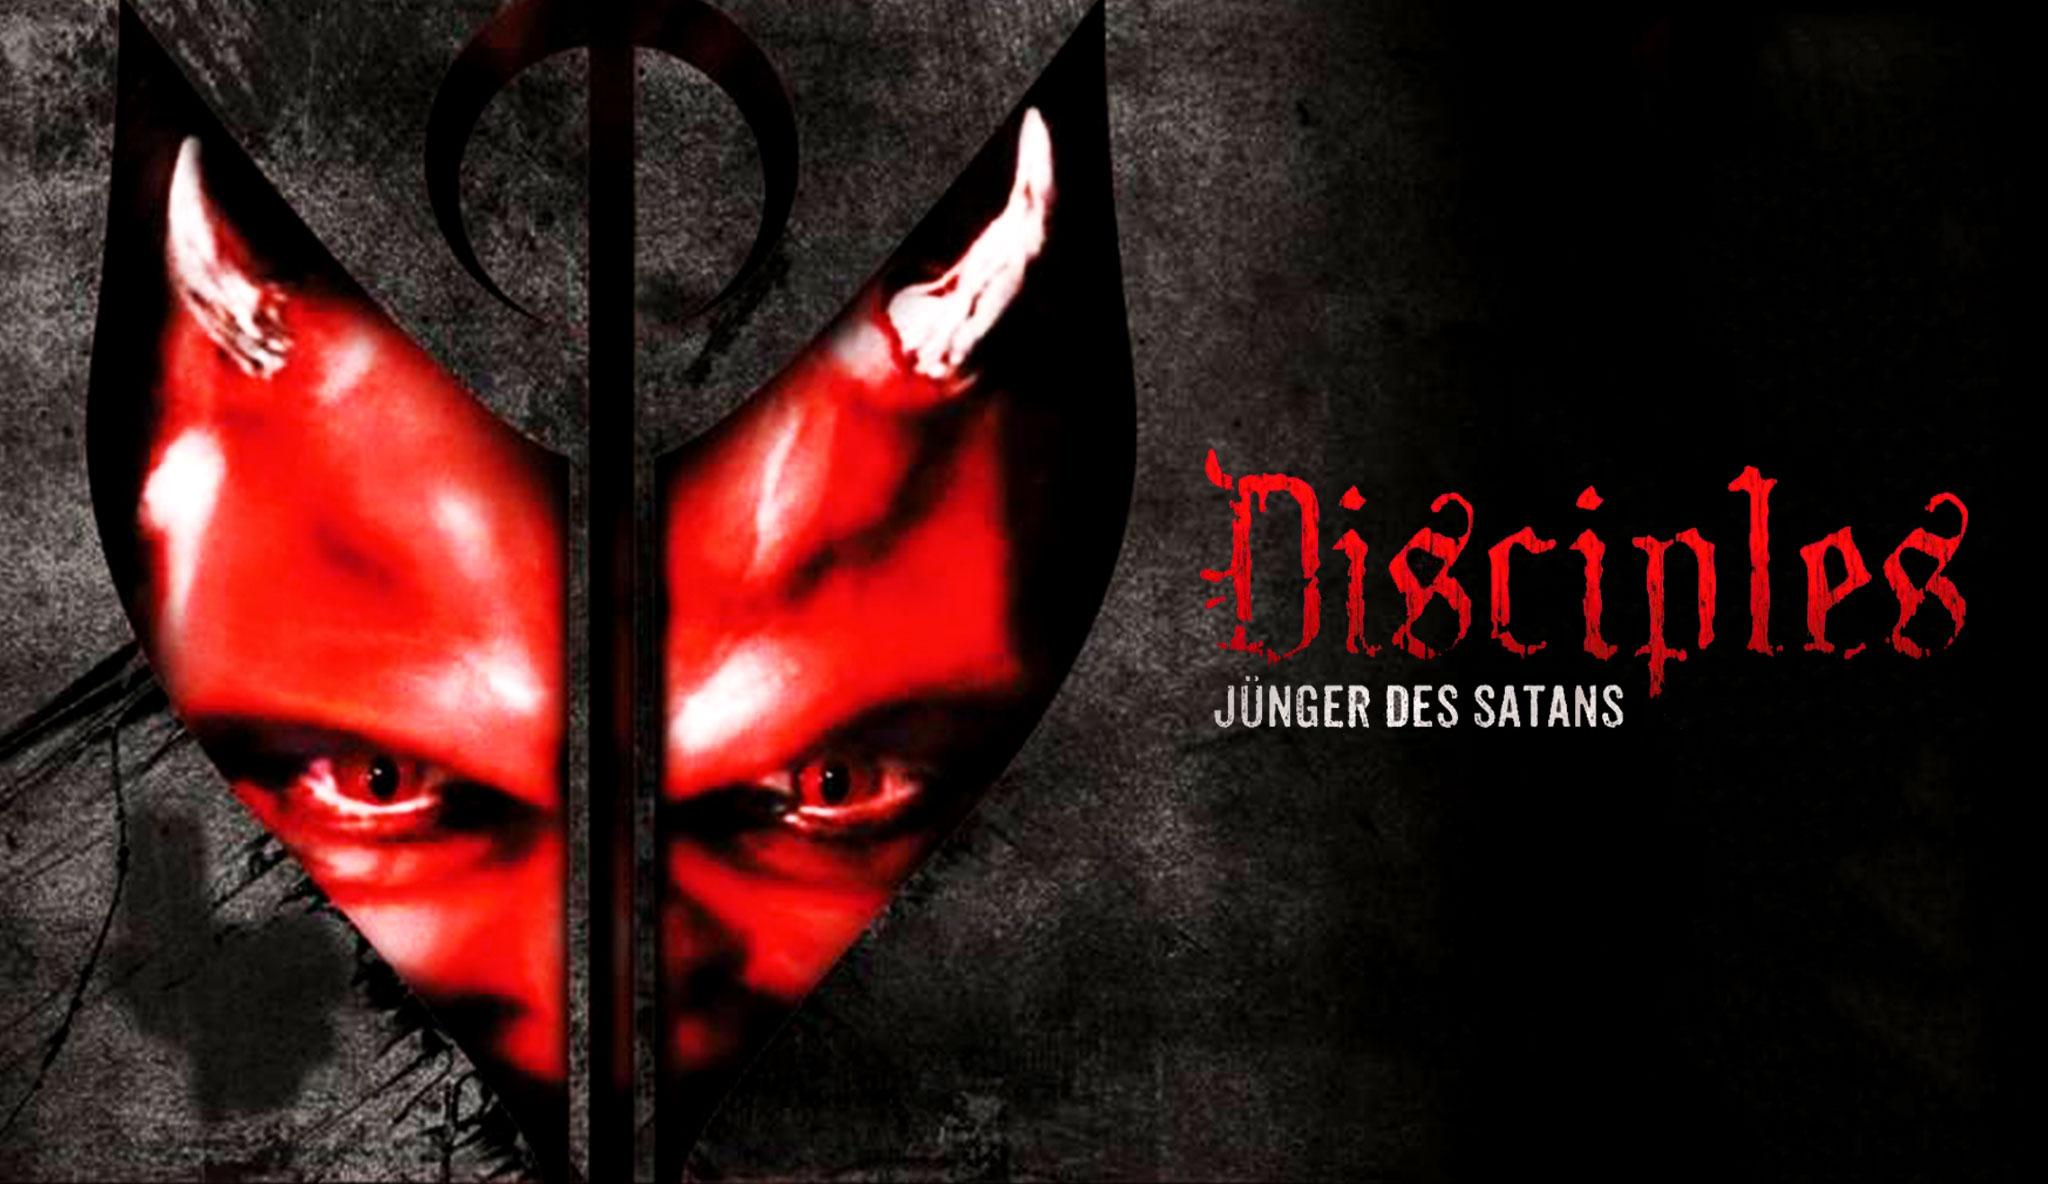 disciples-junger-des-satans\header.jpg